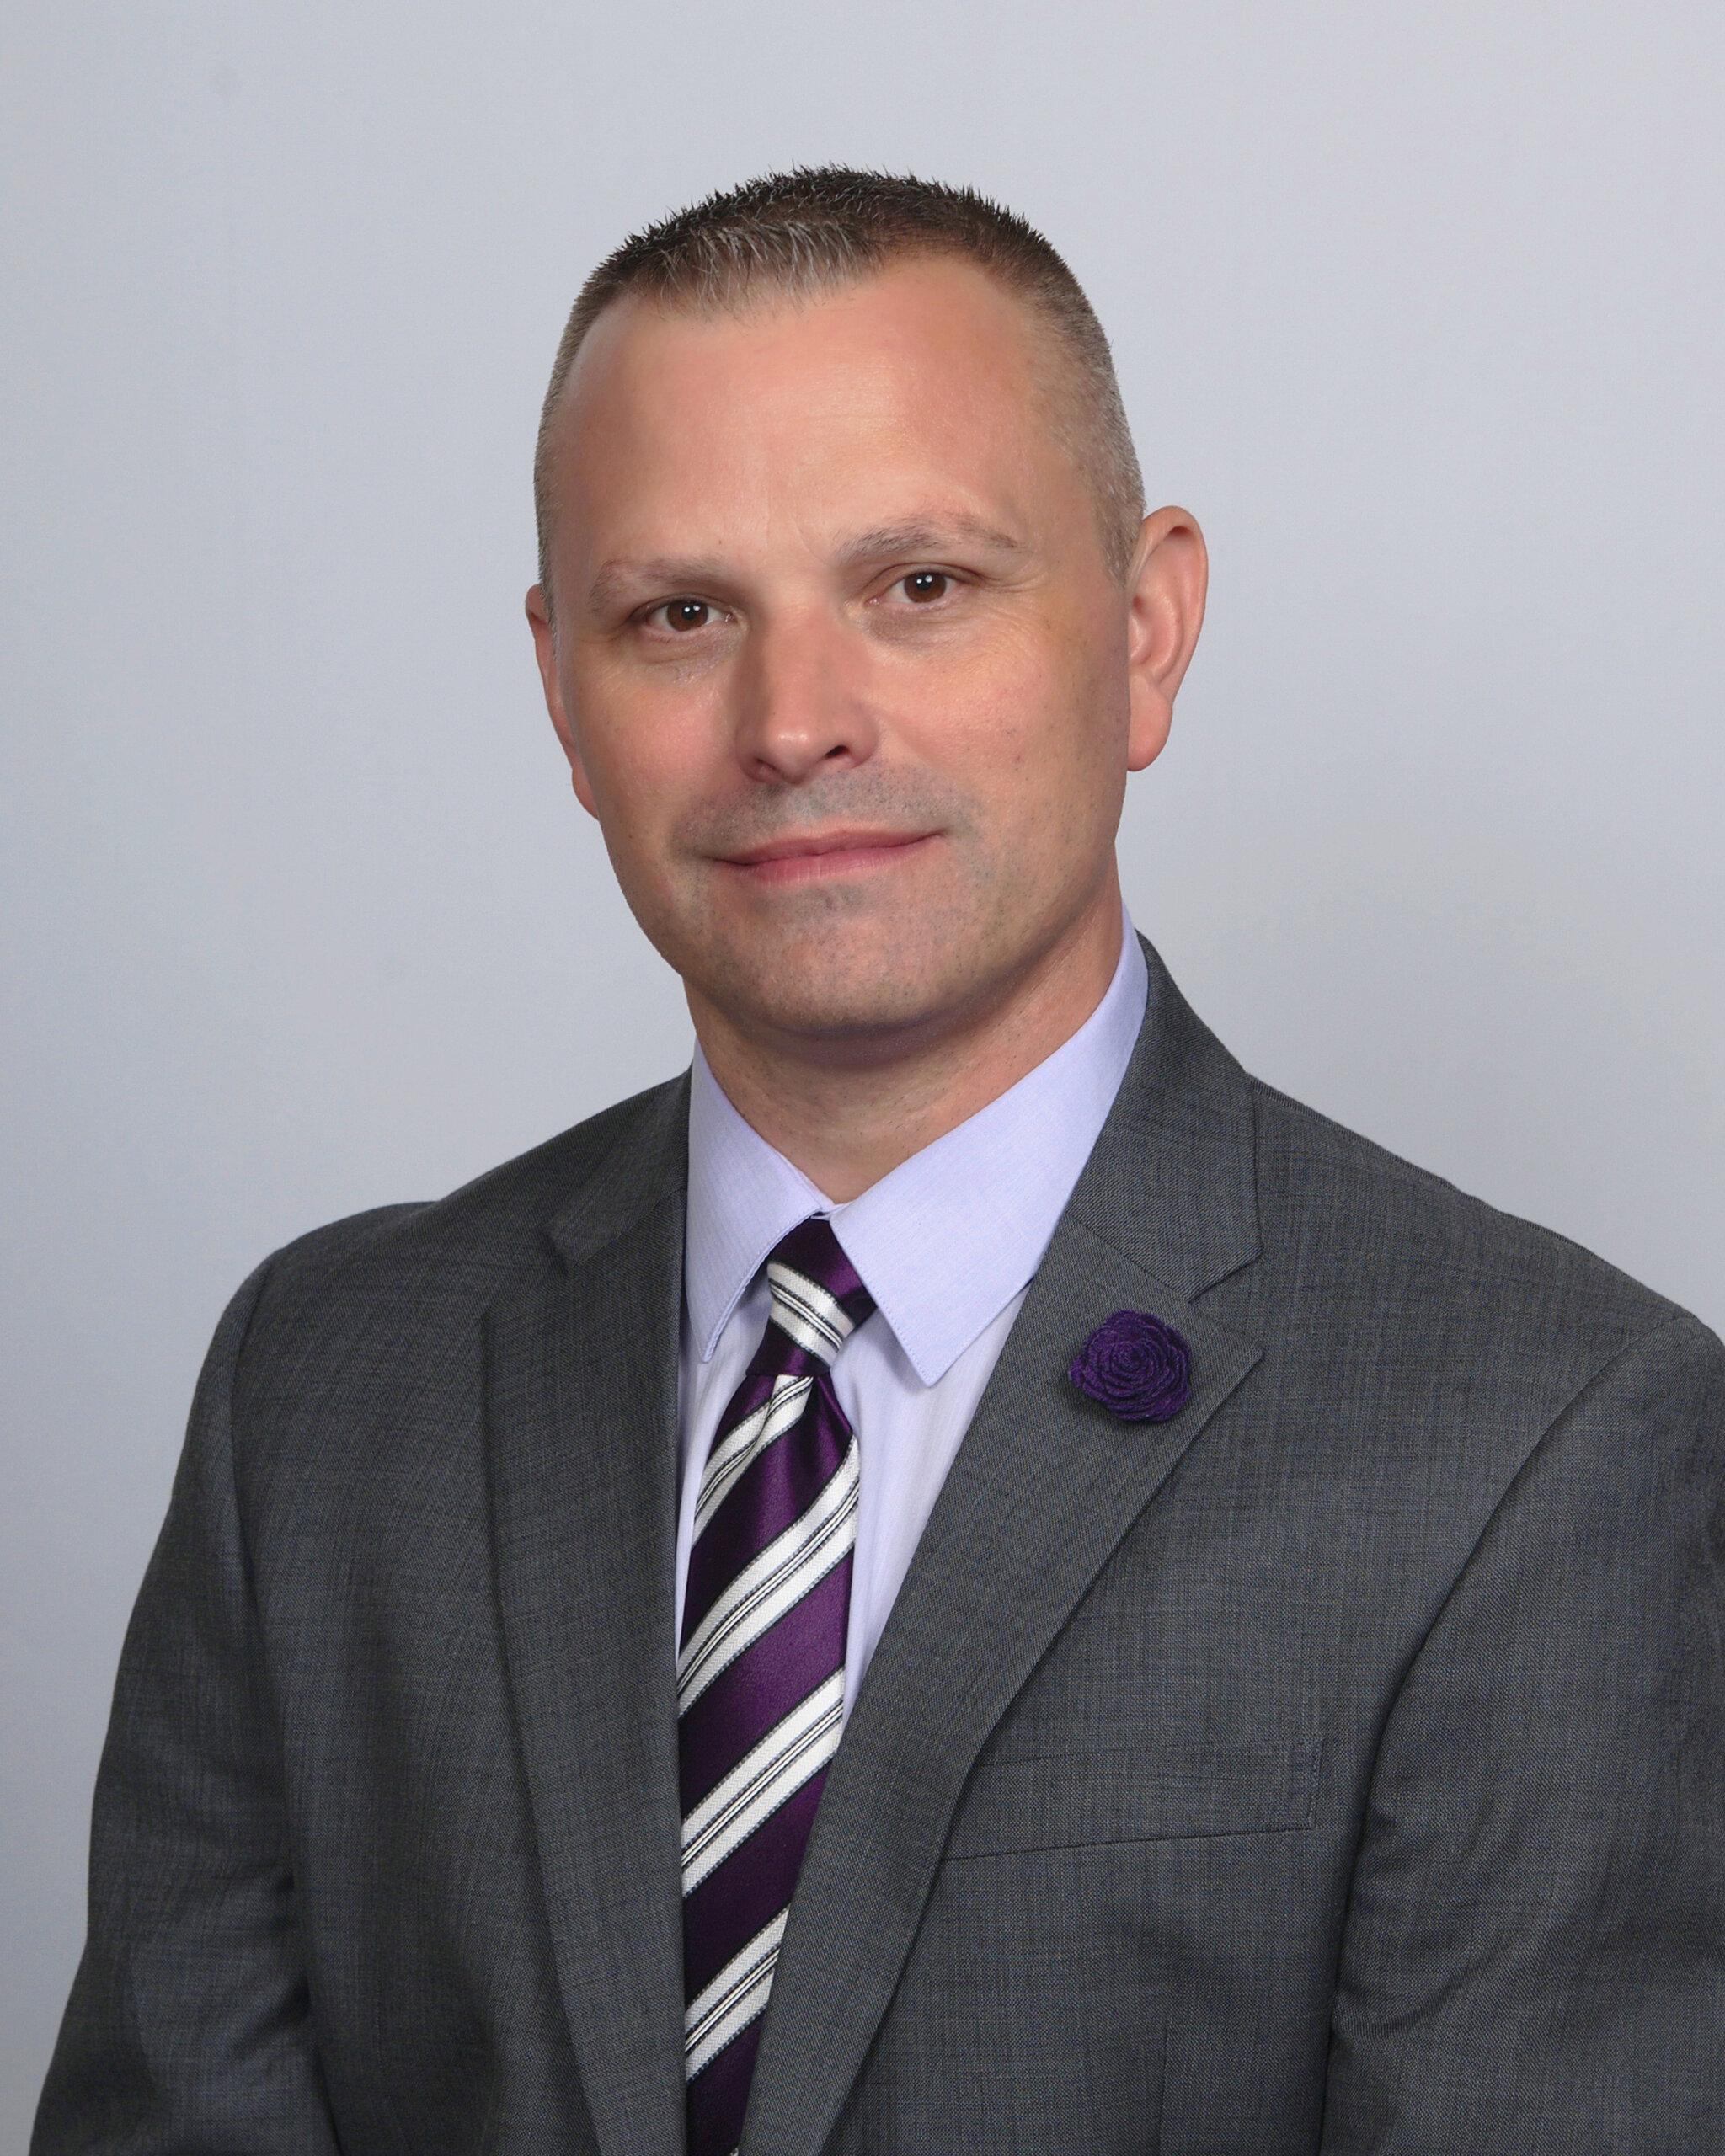 Casey Lloyd : Funeral Director